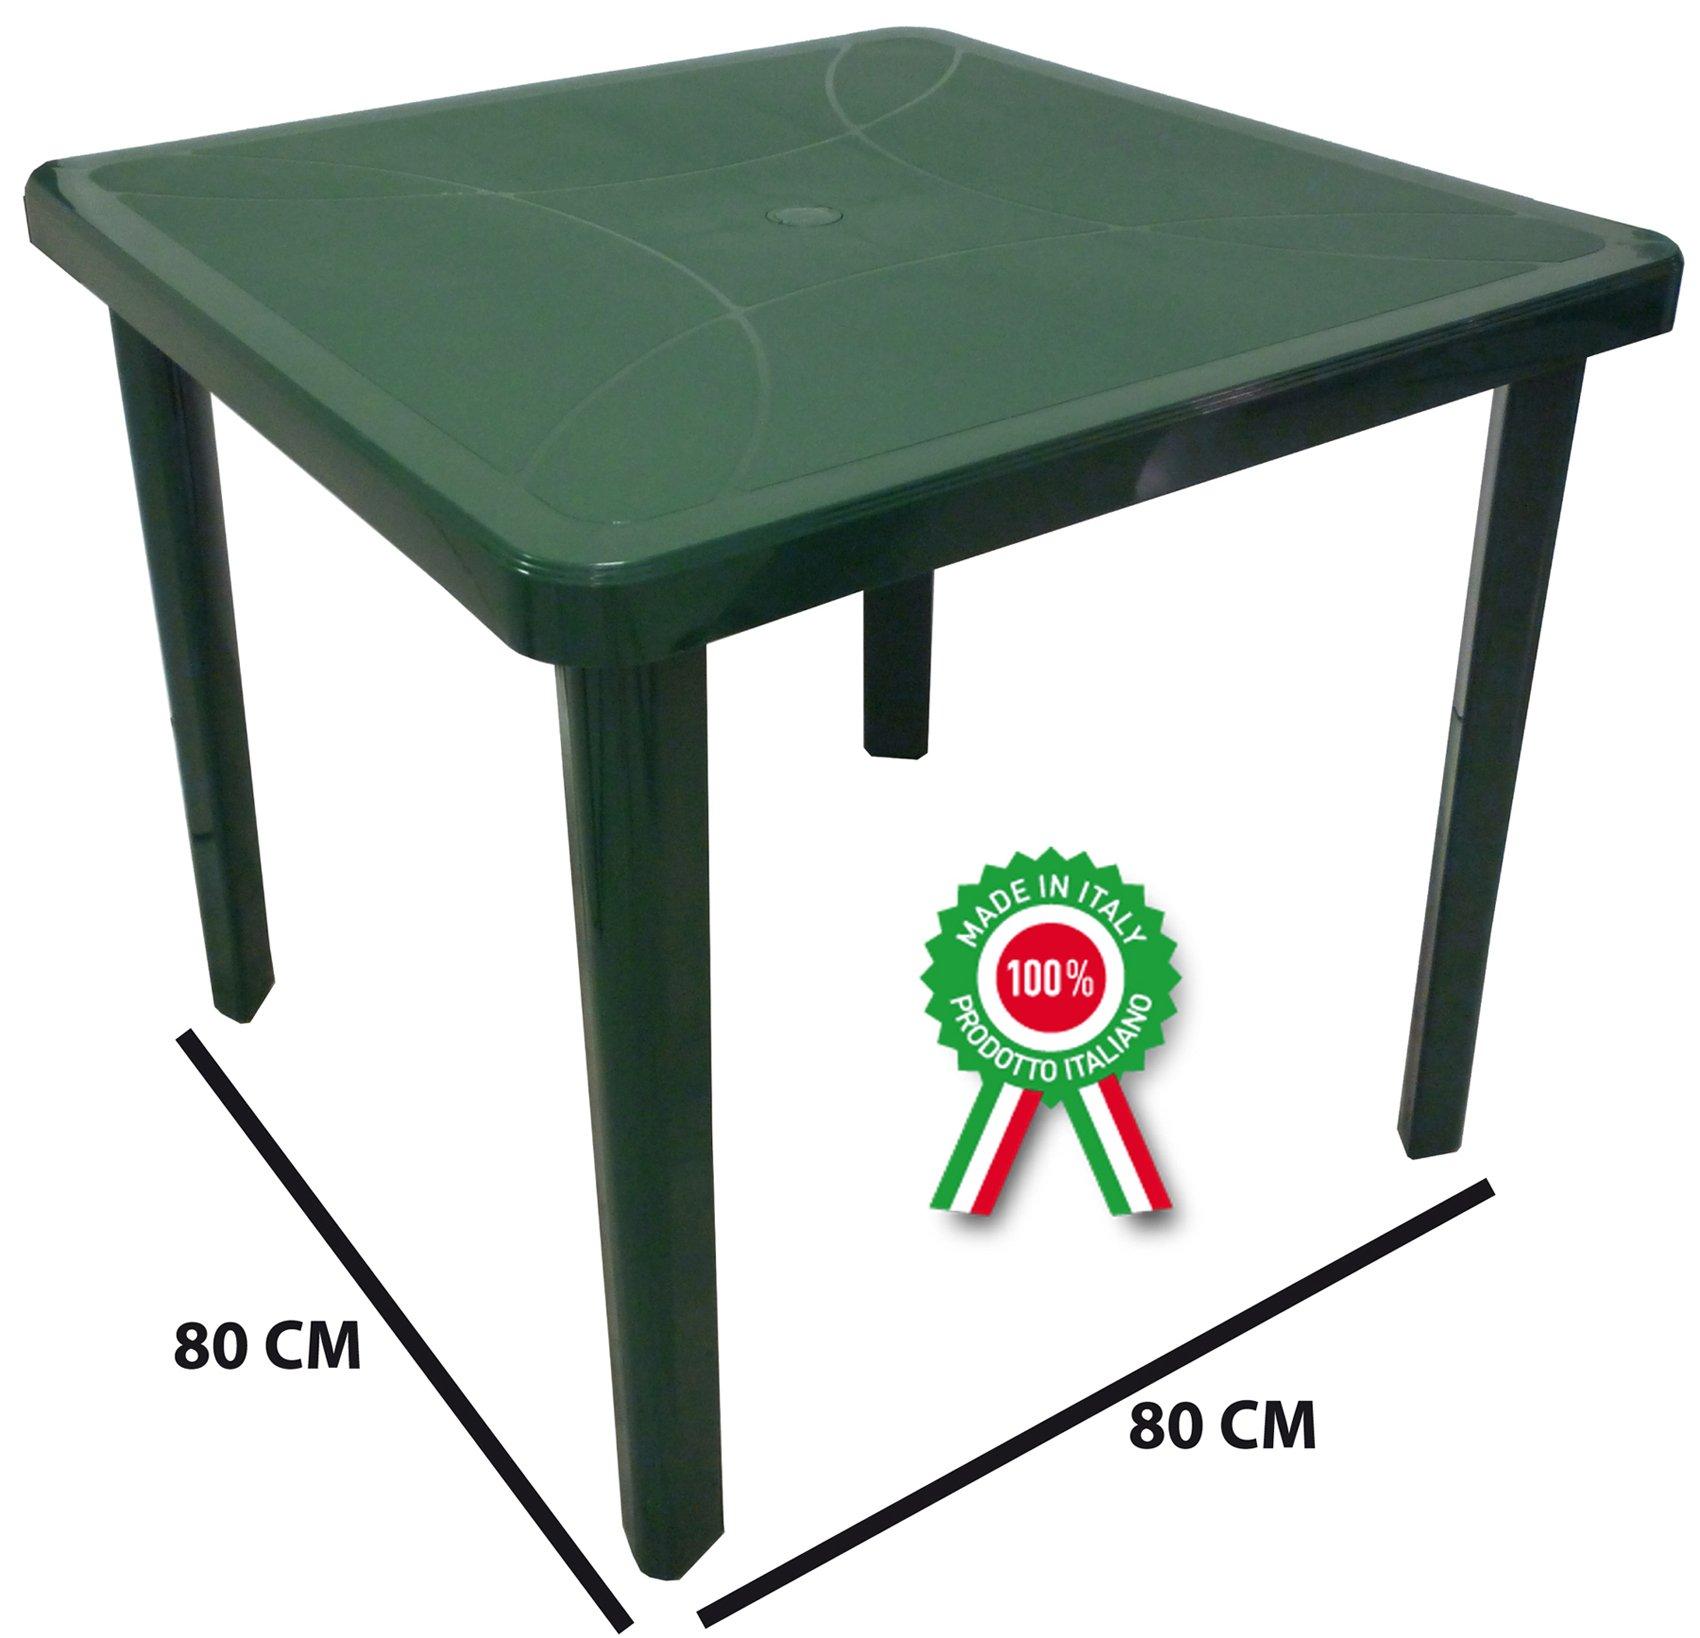 Mesa Mesa cuadrado 80 x 80 Neptune de dura resina de plástico verde con agujero para sombrilla para exterior Casa balcón Bar Sagra de jardín: Amazon.es: Jardín